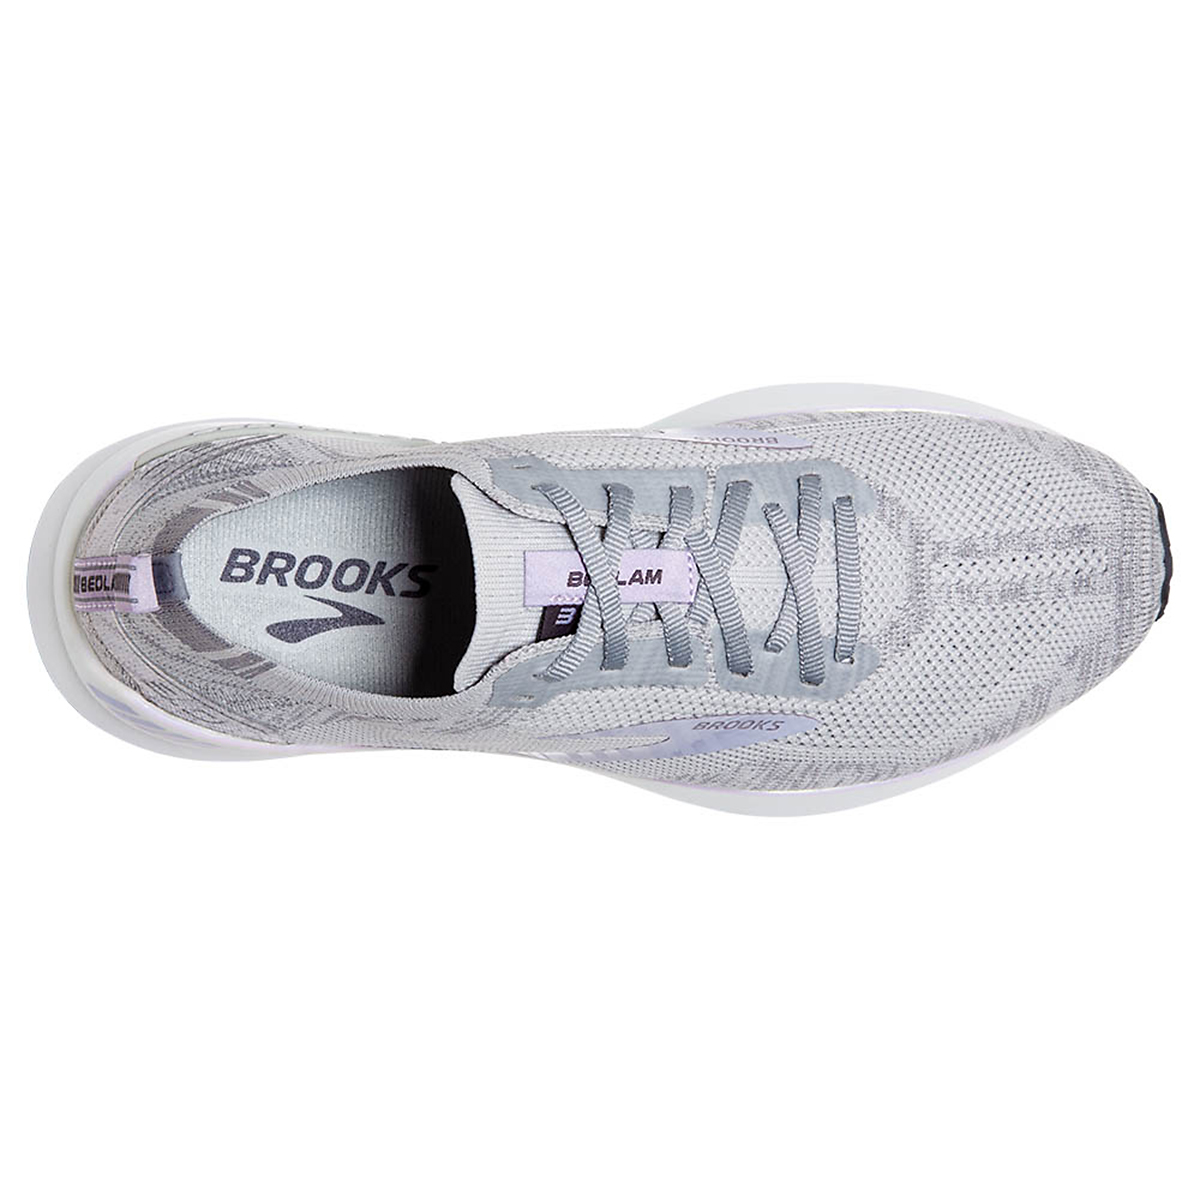 Women's Brooks Bedlam 3 Running Shoe - Color: Oyster/Purple Heather - Size: 5 - Width: Regular, Oyster/Purple Heather, large, image 5